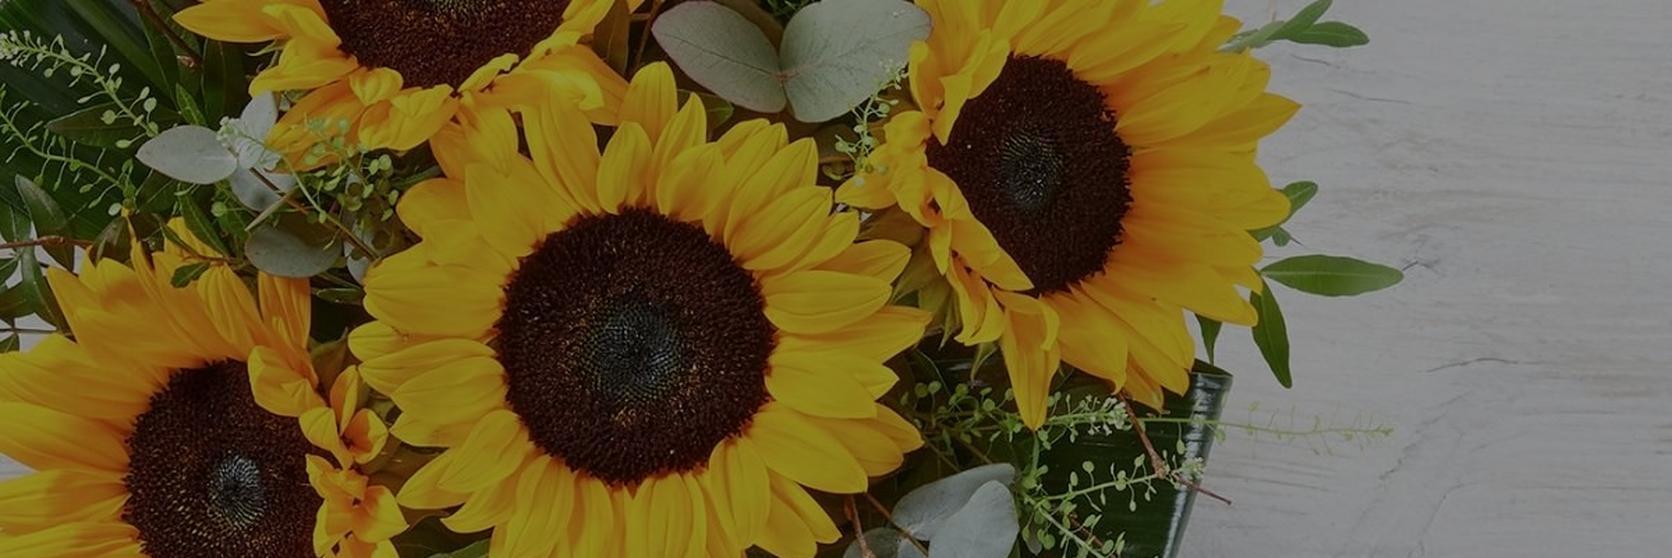 Untitled-design-4-sunflowers